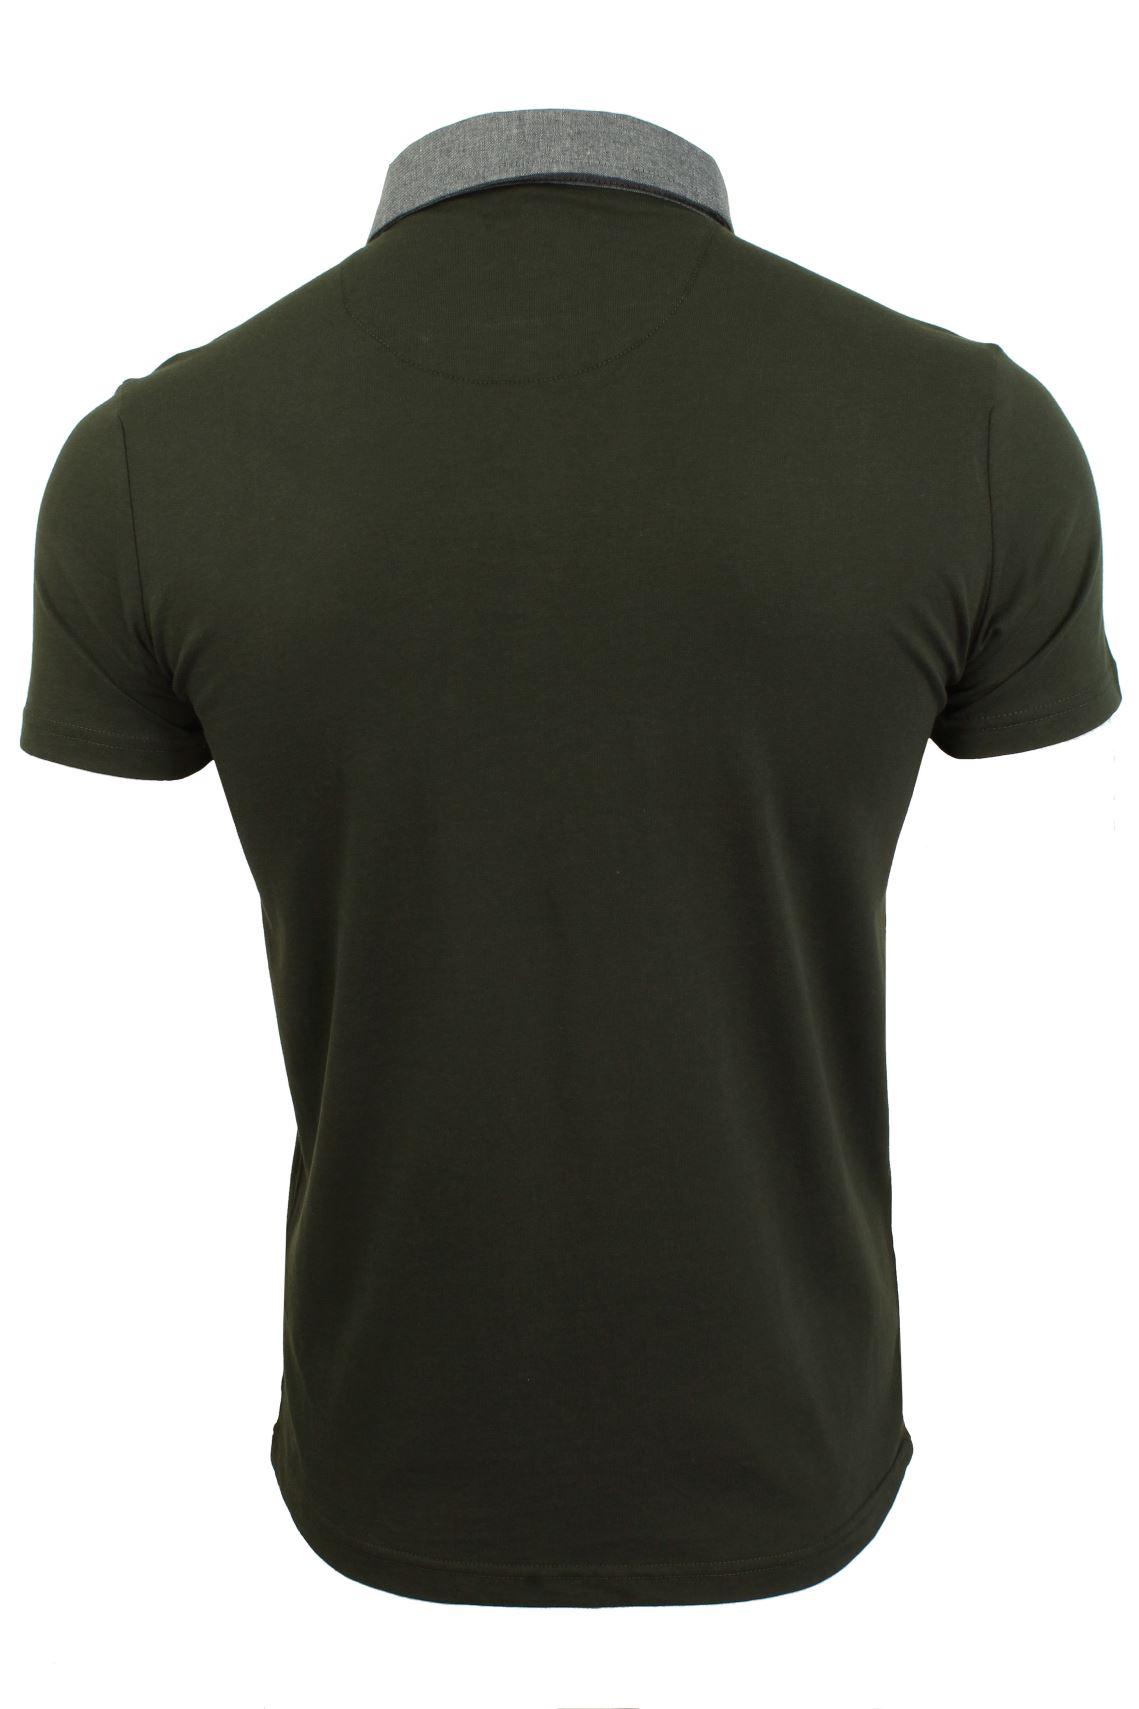 Mens-Polo-T-Shirt-Chimera-Brave-Soul-Denim-Chambray-Collar-Short-Sleeved-Cotton thumbnail 15